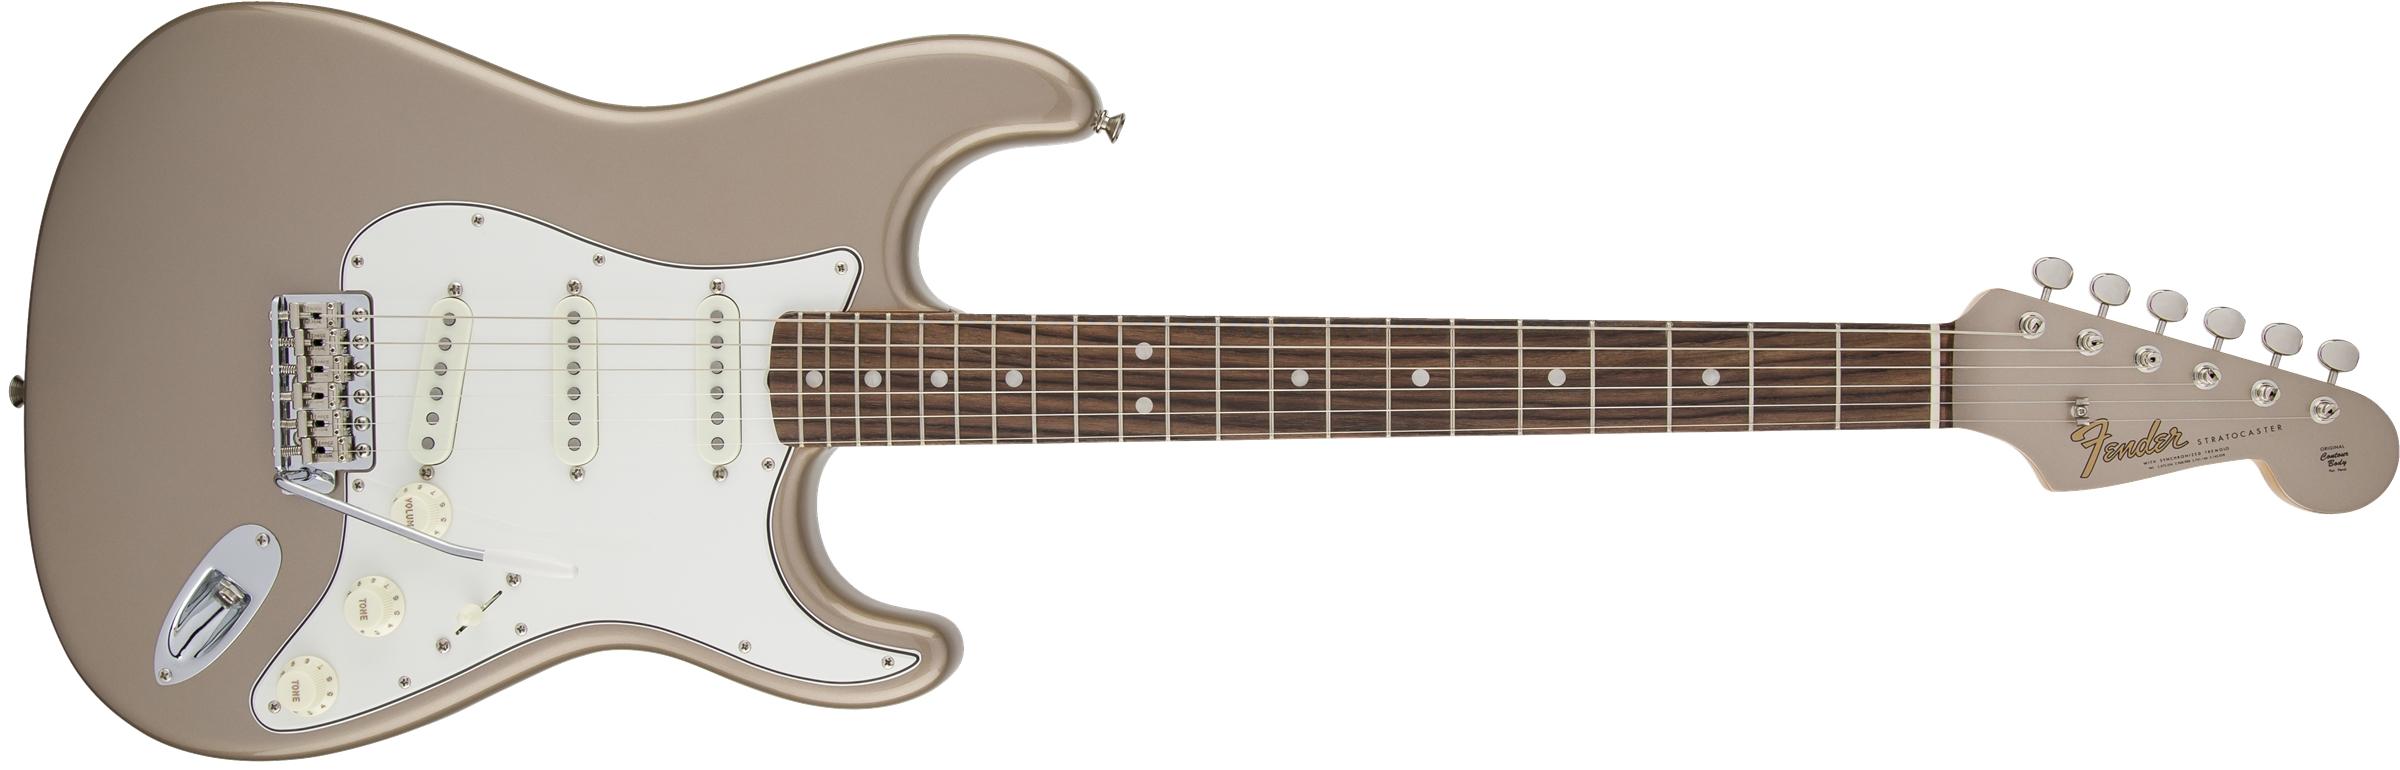 Guitare electrique vintage fender eBay